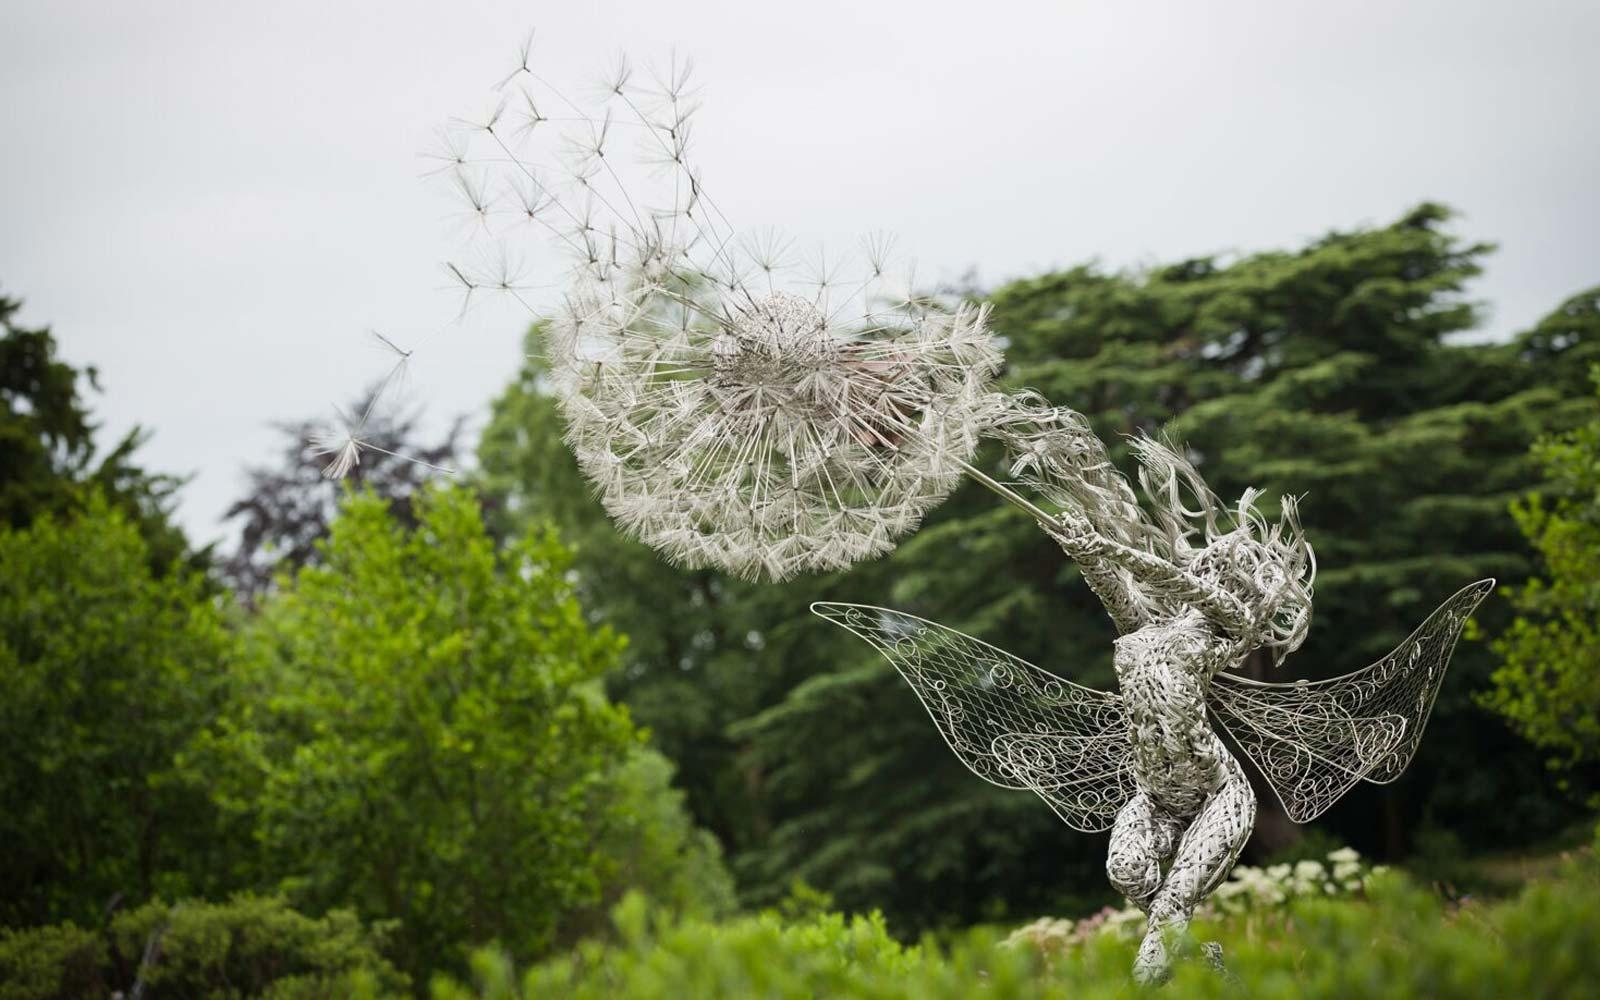 trentham-dances-with-dandelions.jpg